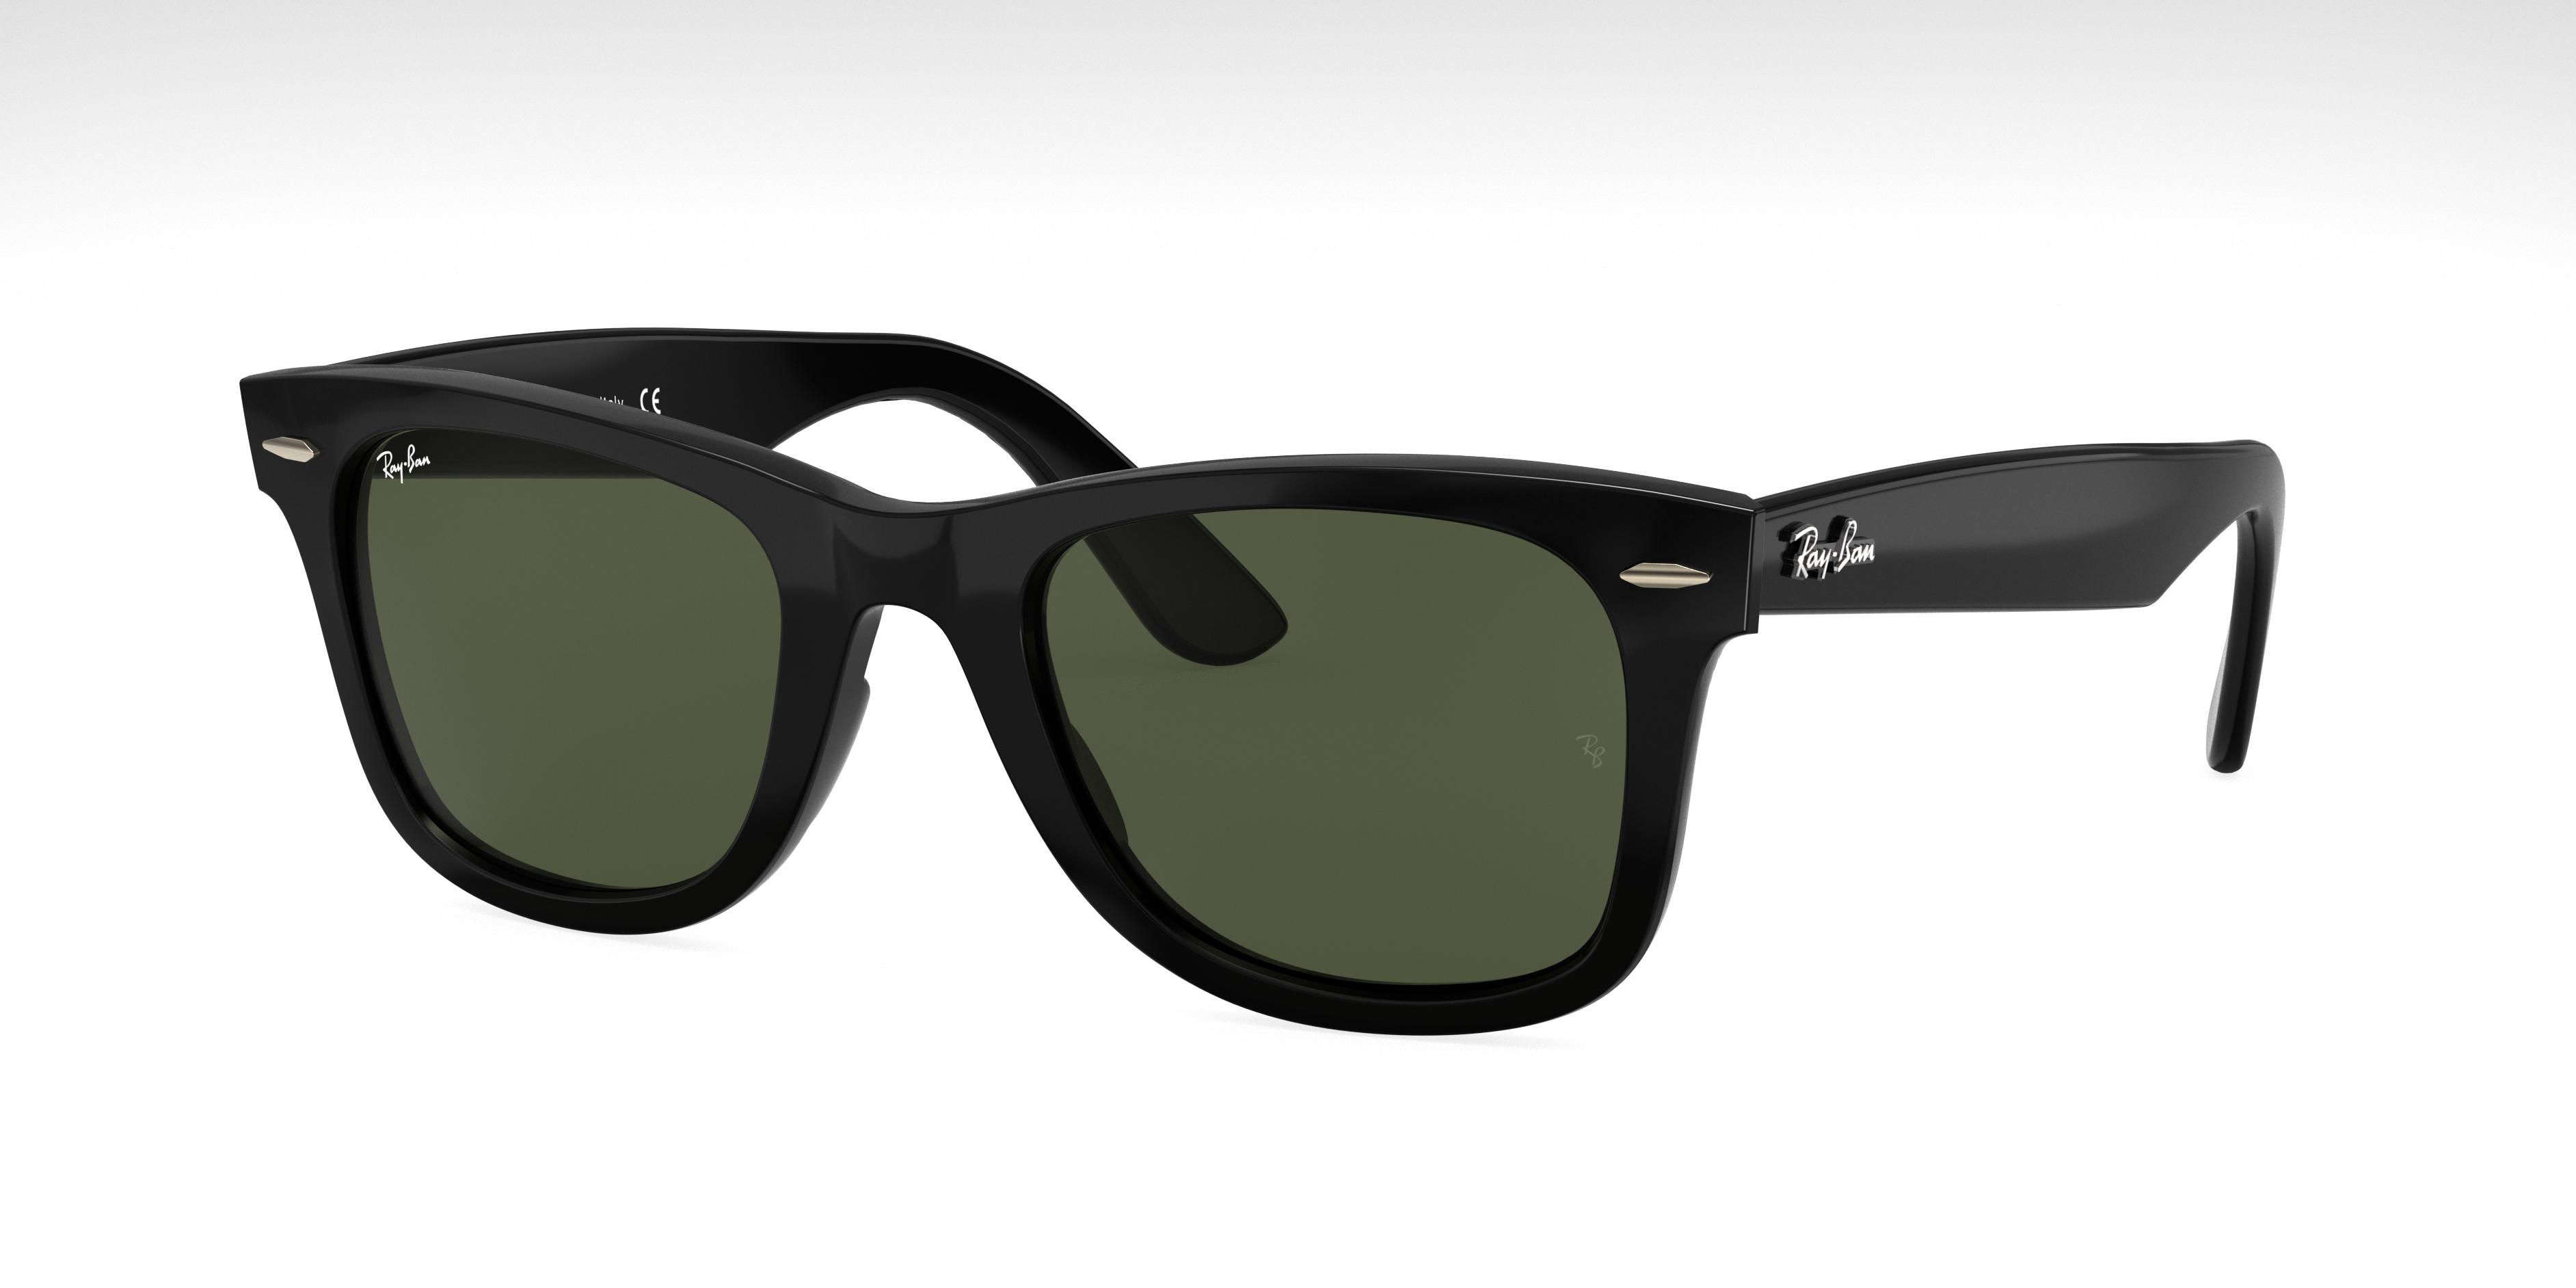 Ray-Ban Wayfarer Ease Black, Green Lenses - RB4340